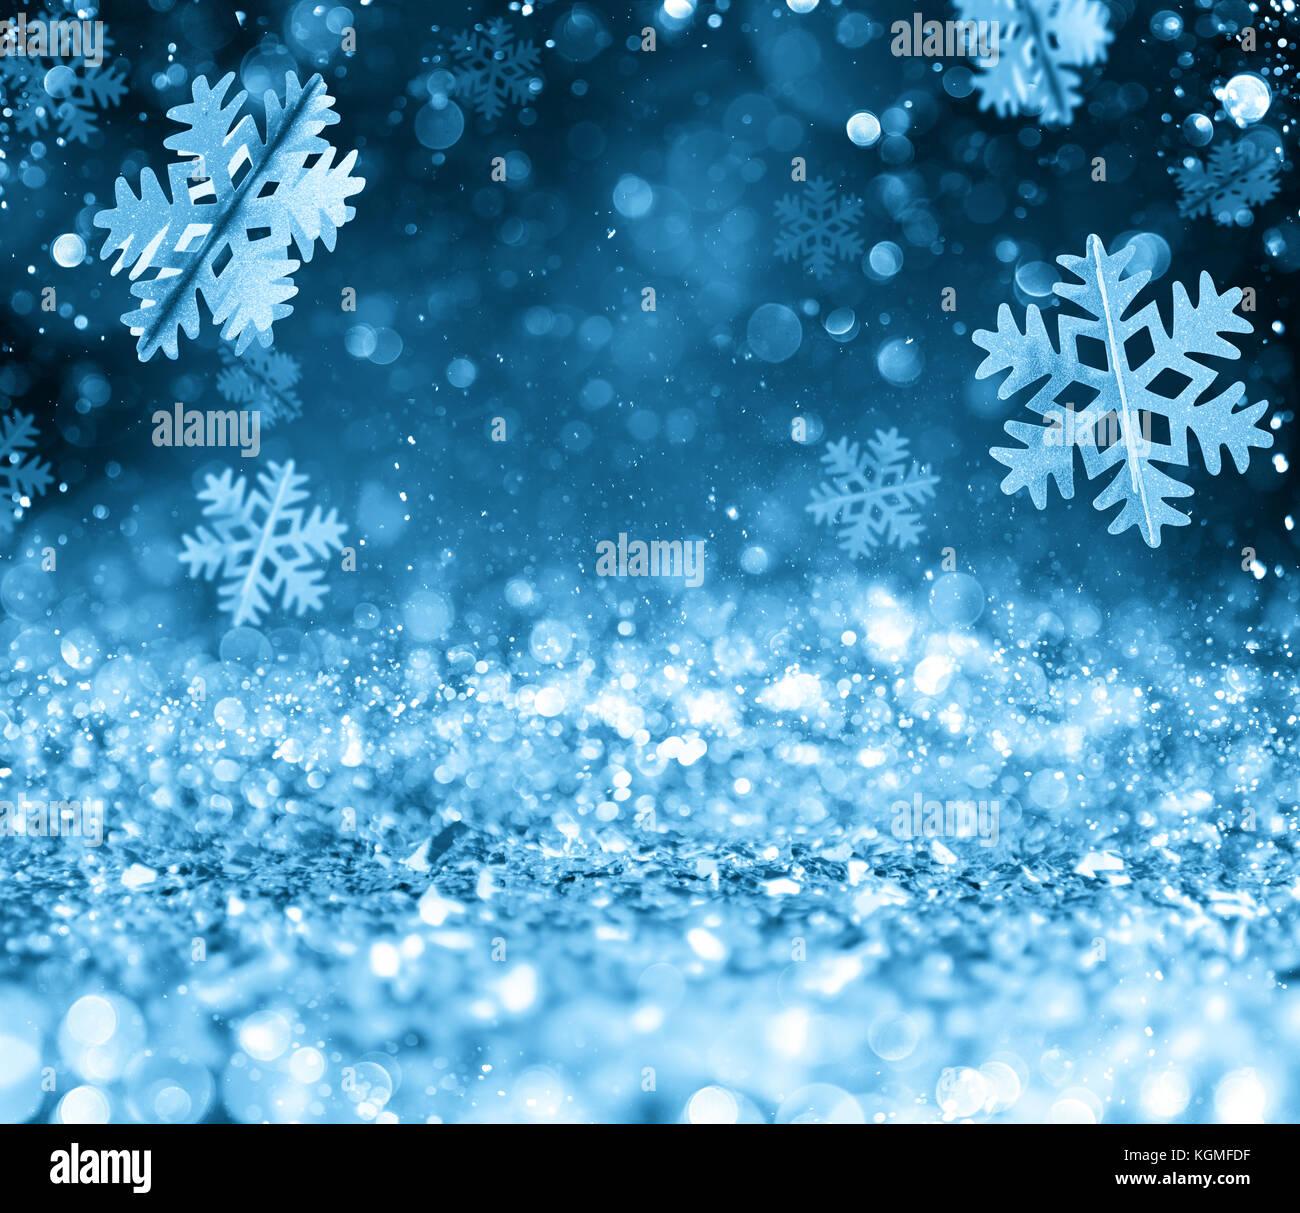 snowflake background.html